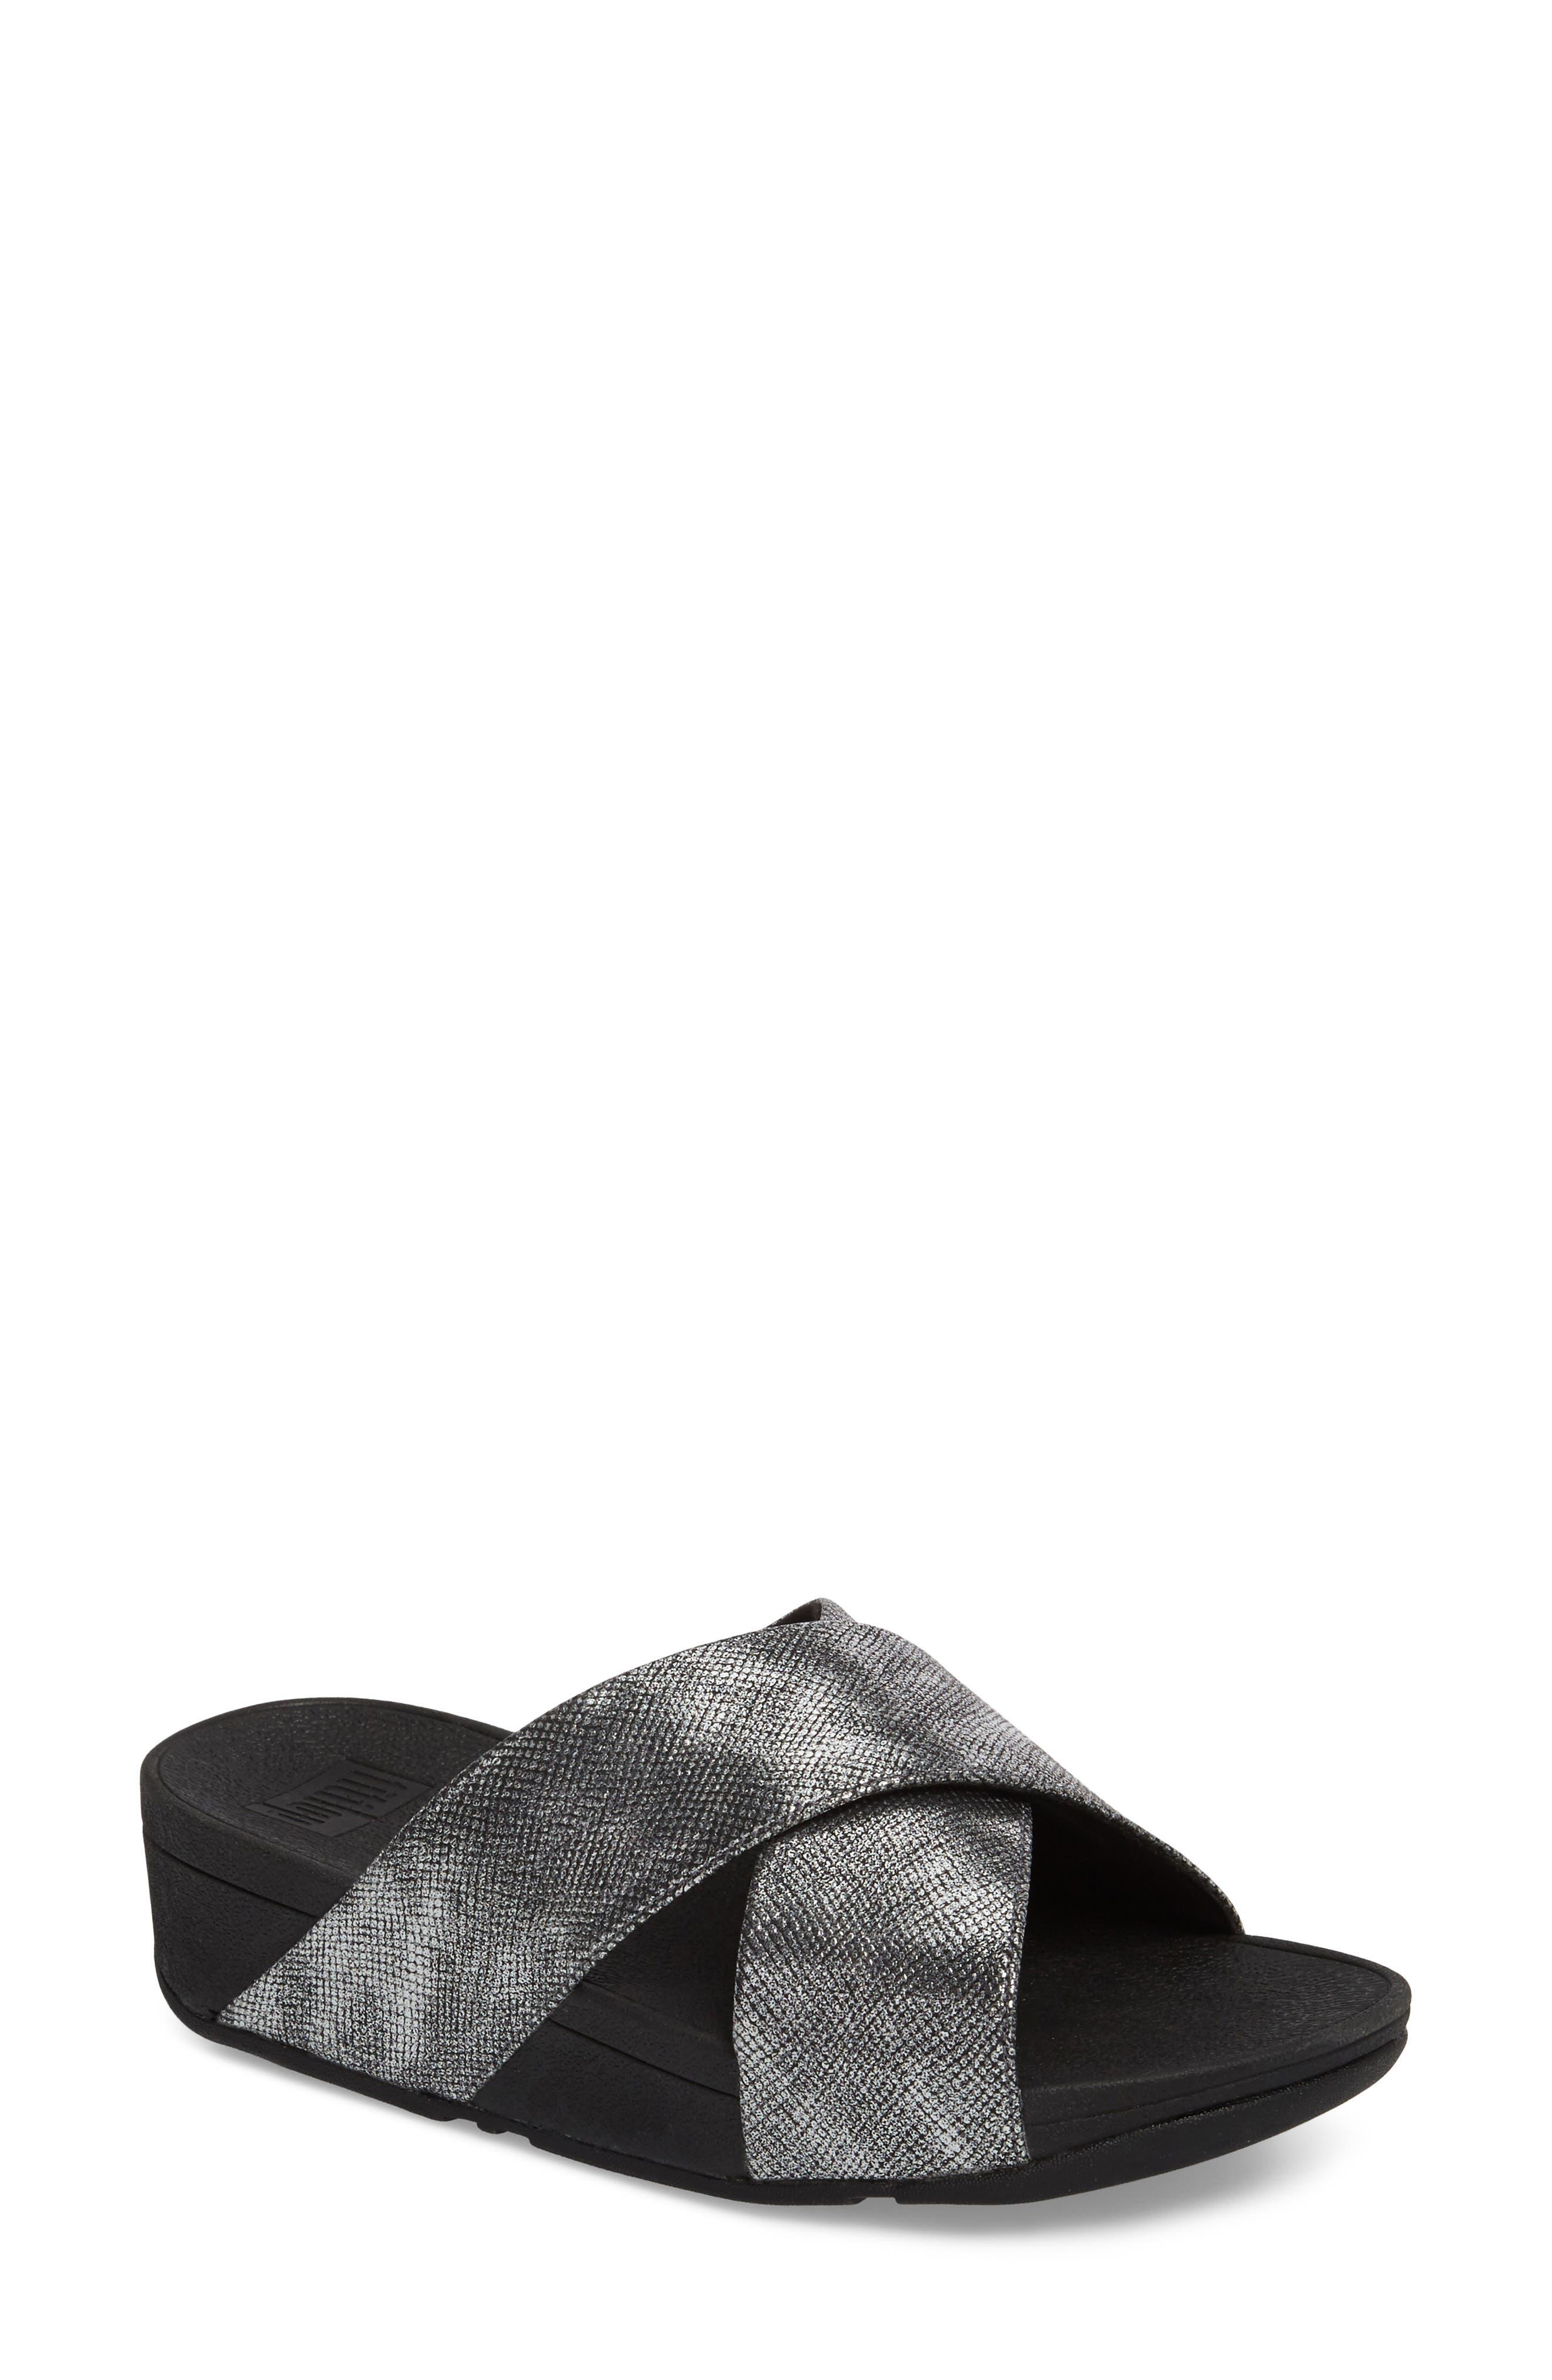 Alternate Image 1 Selected - FitFlop Lulu Cross Slide Sandal (Women)